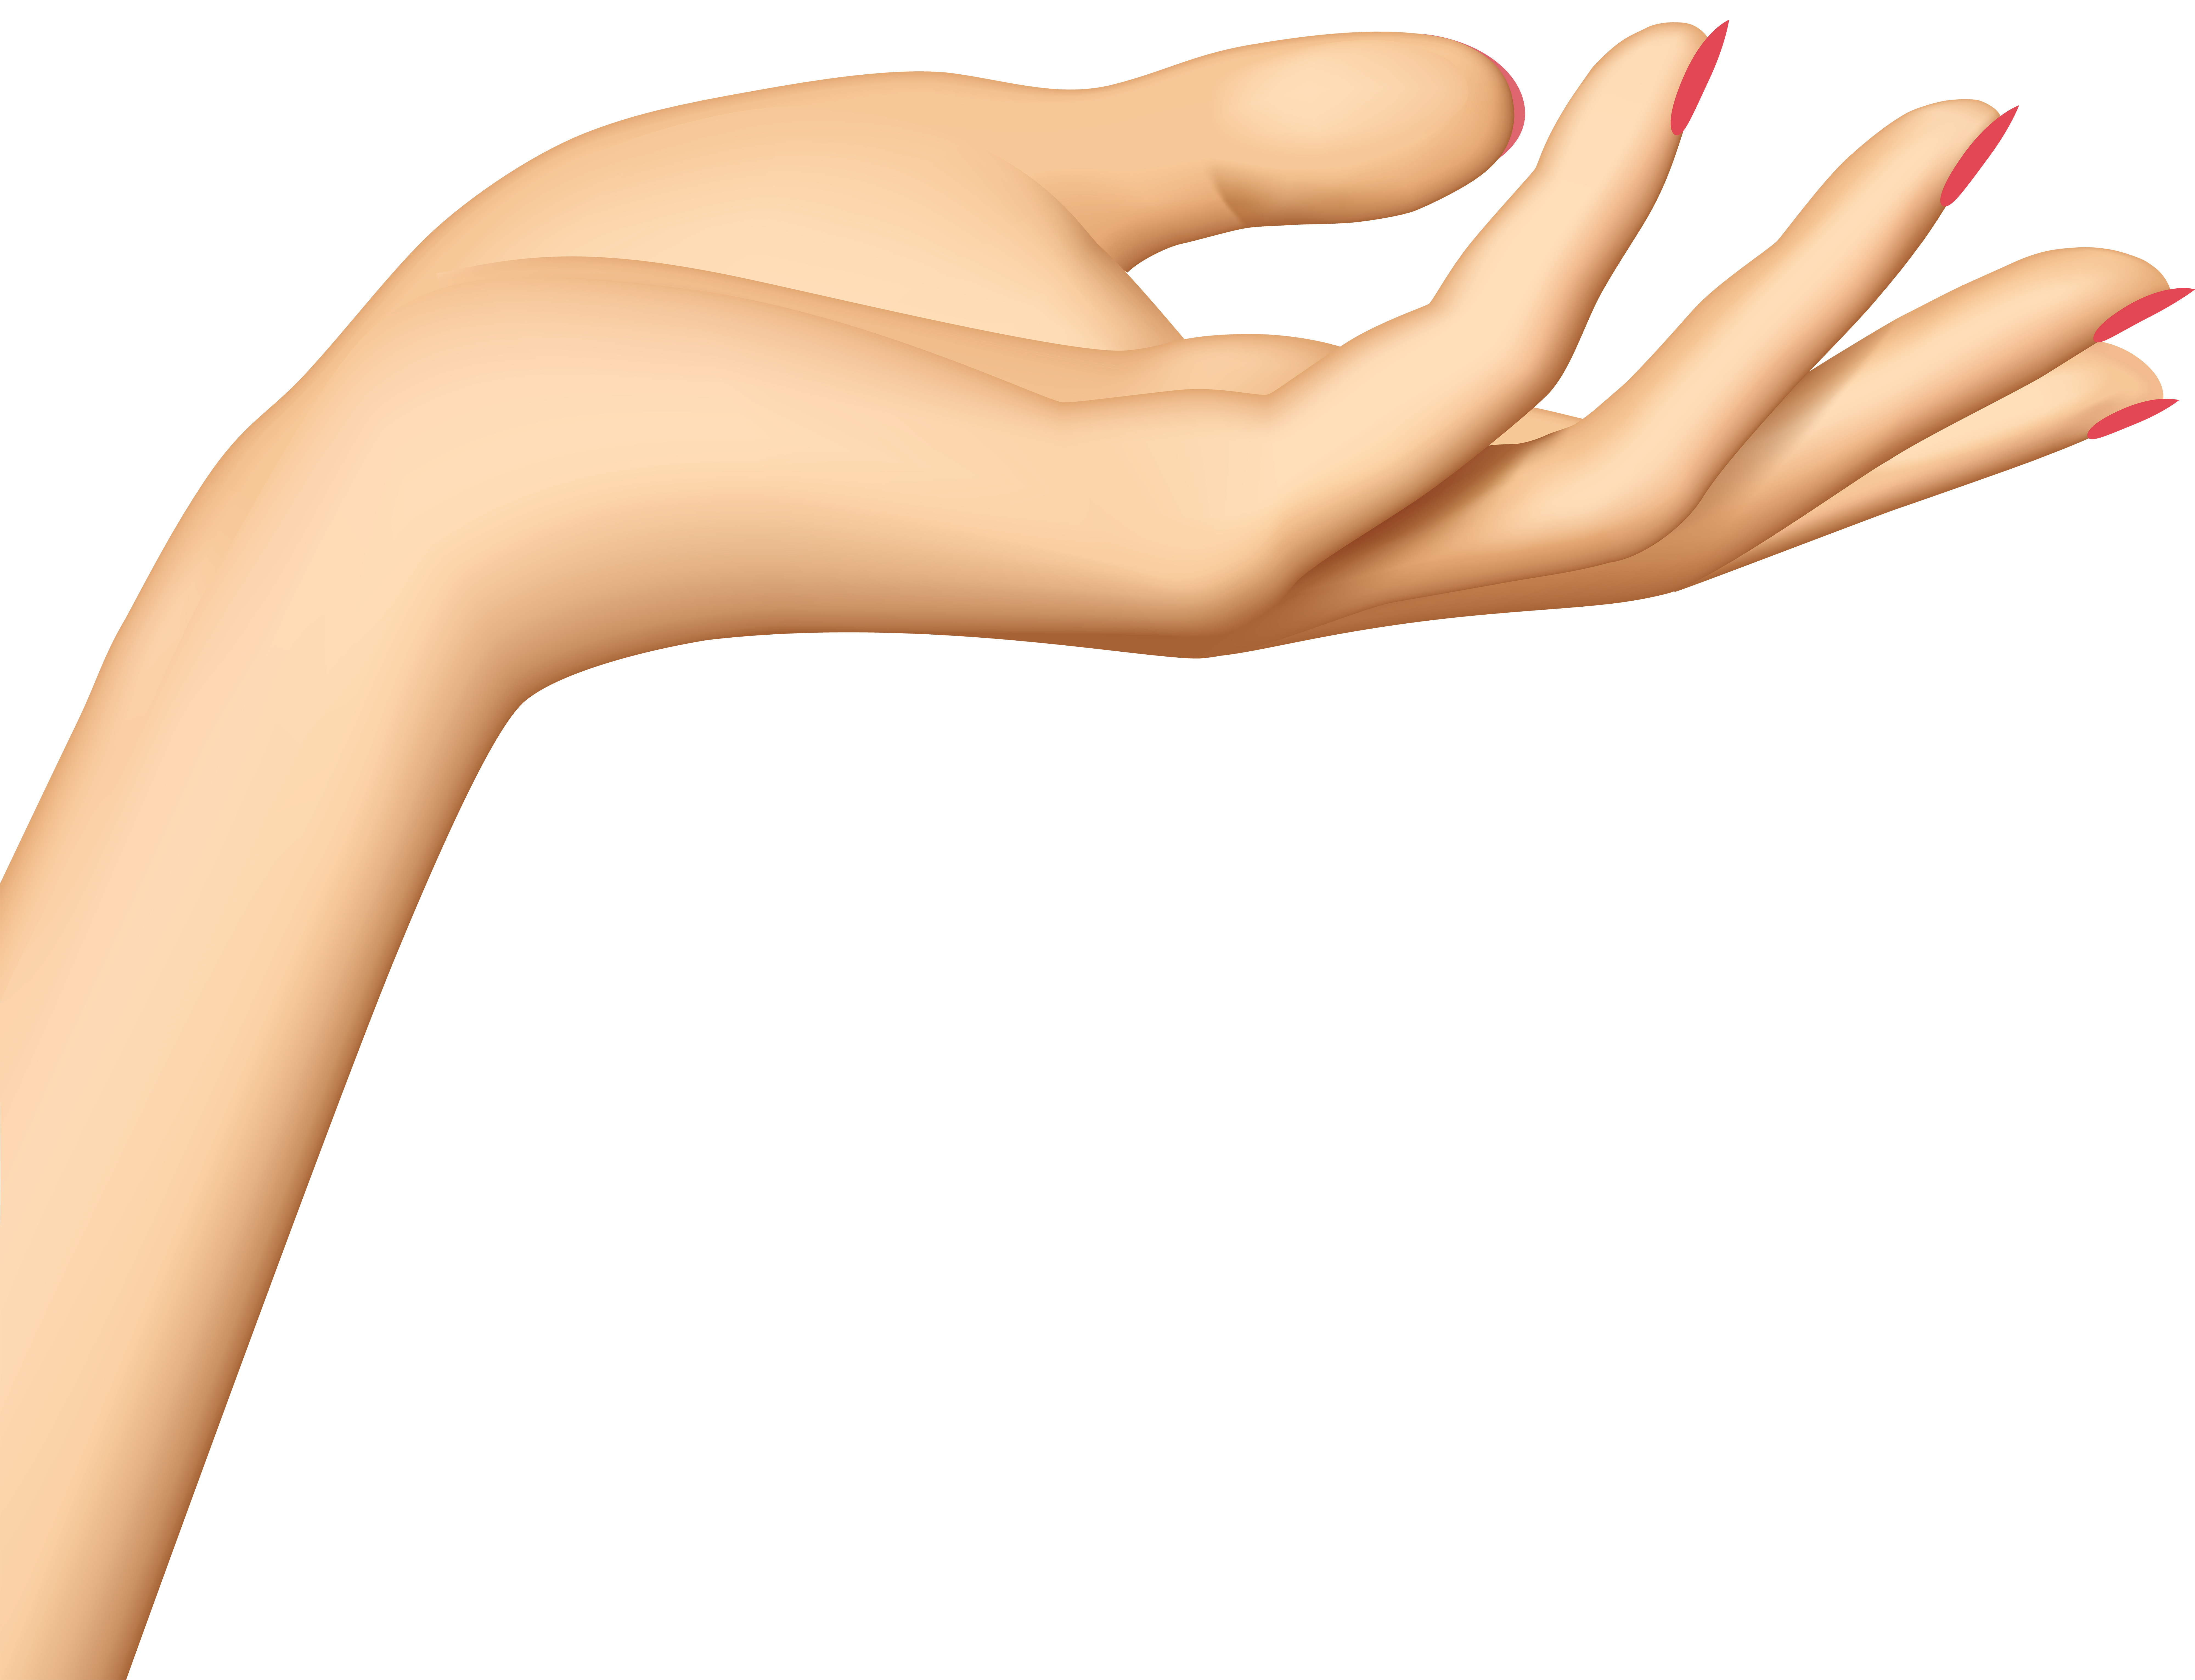 Skin clipart human skin. Hand transparent png clip